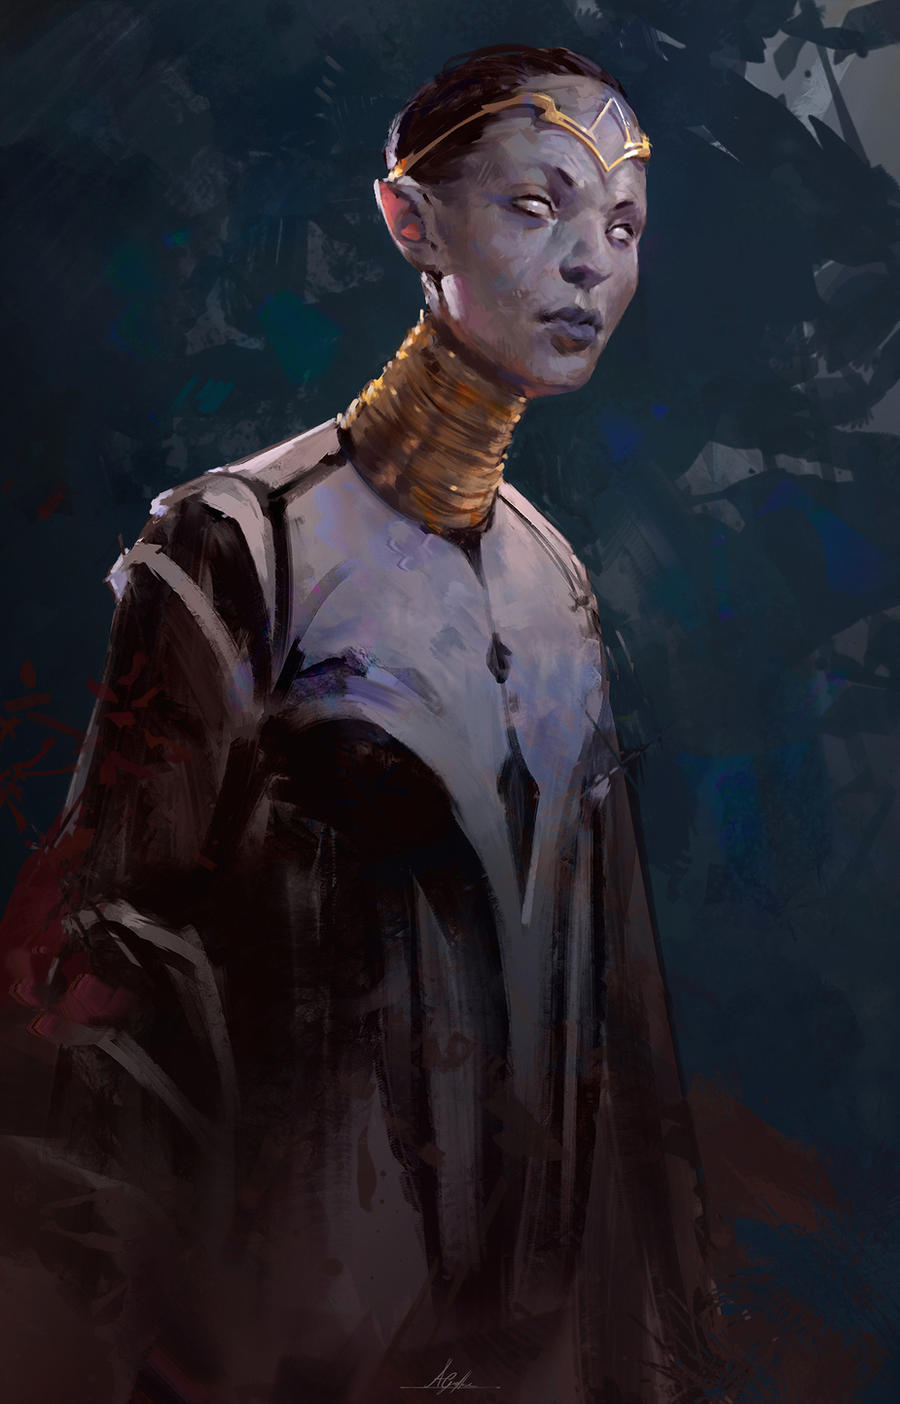 Character by AaronGriffinArt